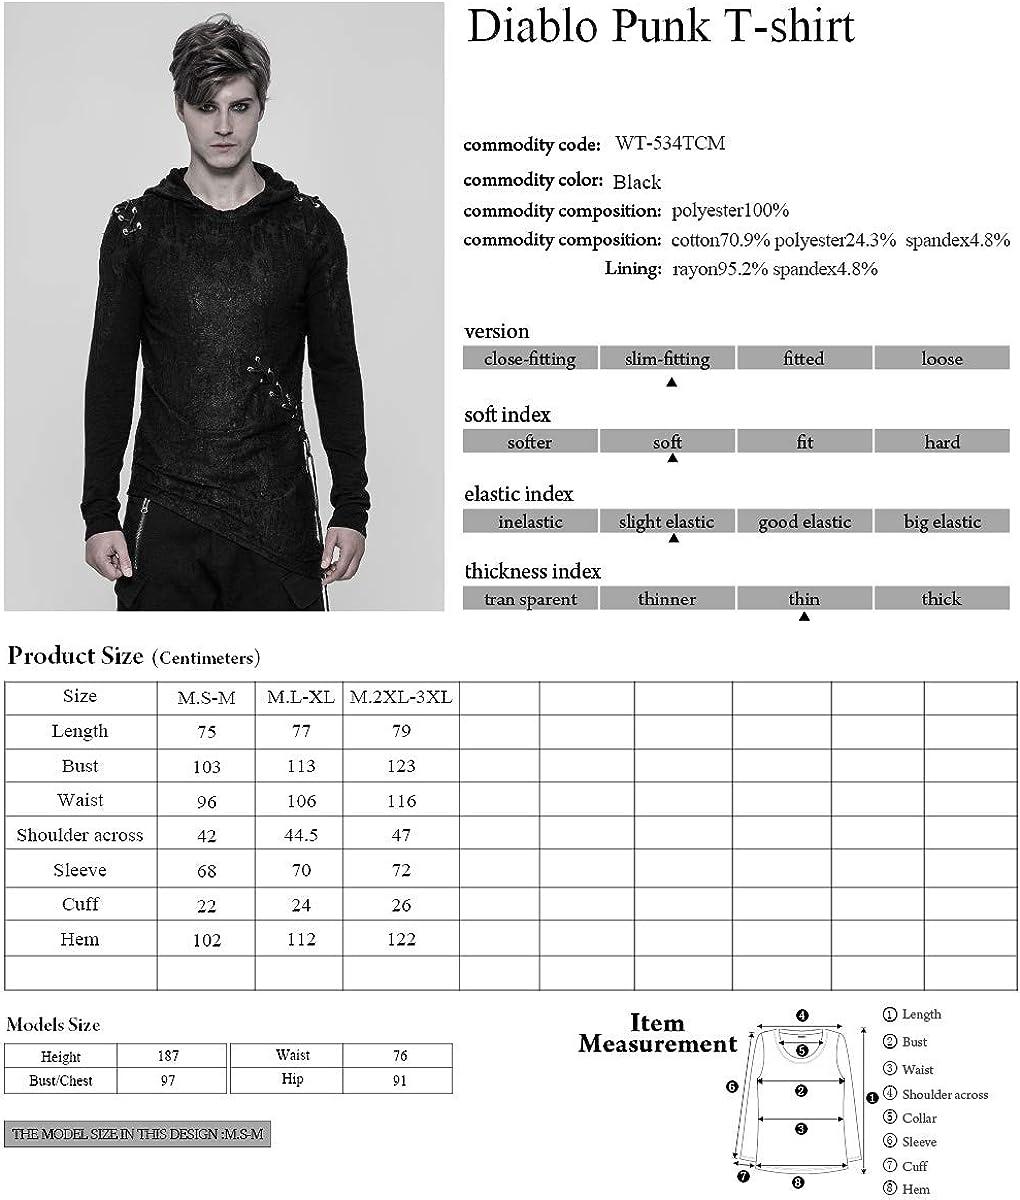 Punk Rave Men Diablo Cool Black T-Shirt Gothic Hoodie Slim-Fitting Cotton Casual Shirt Tops